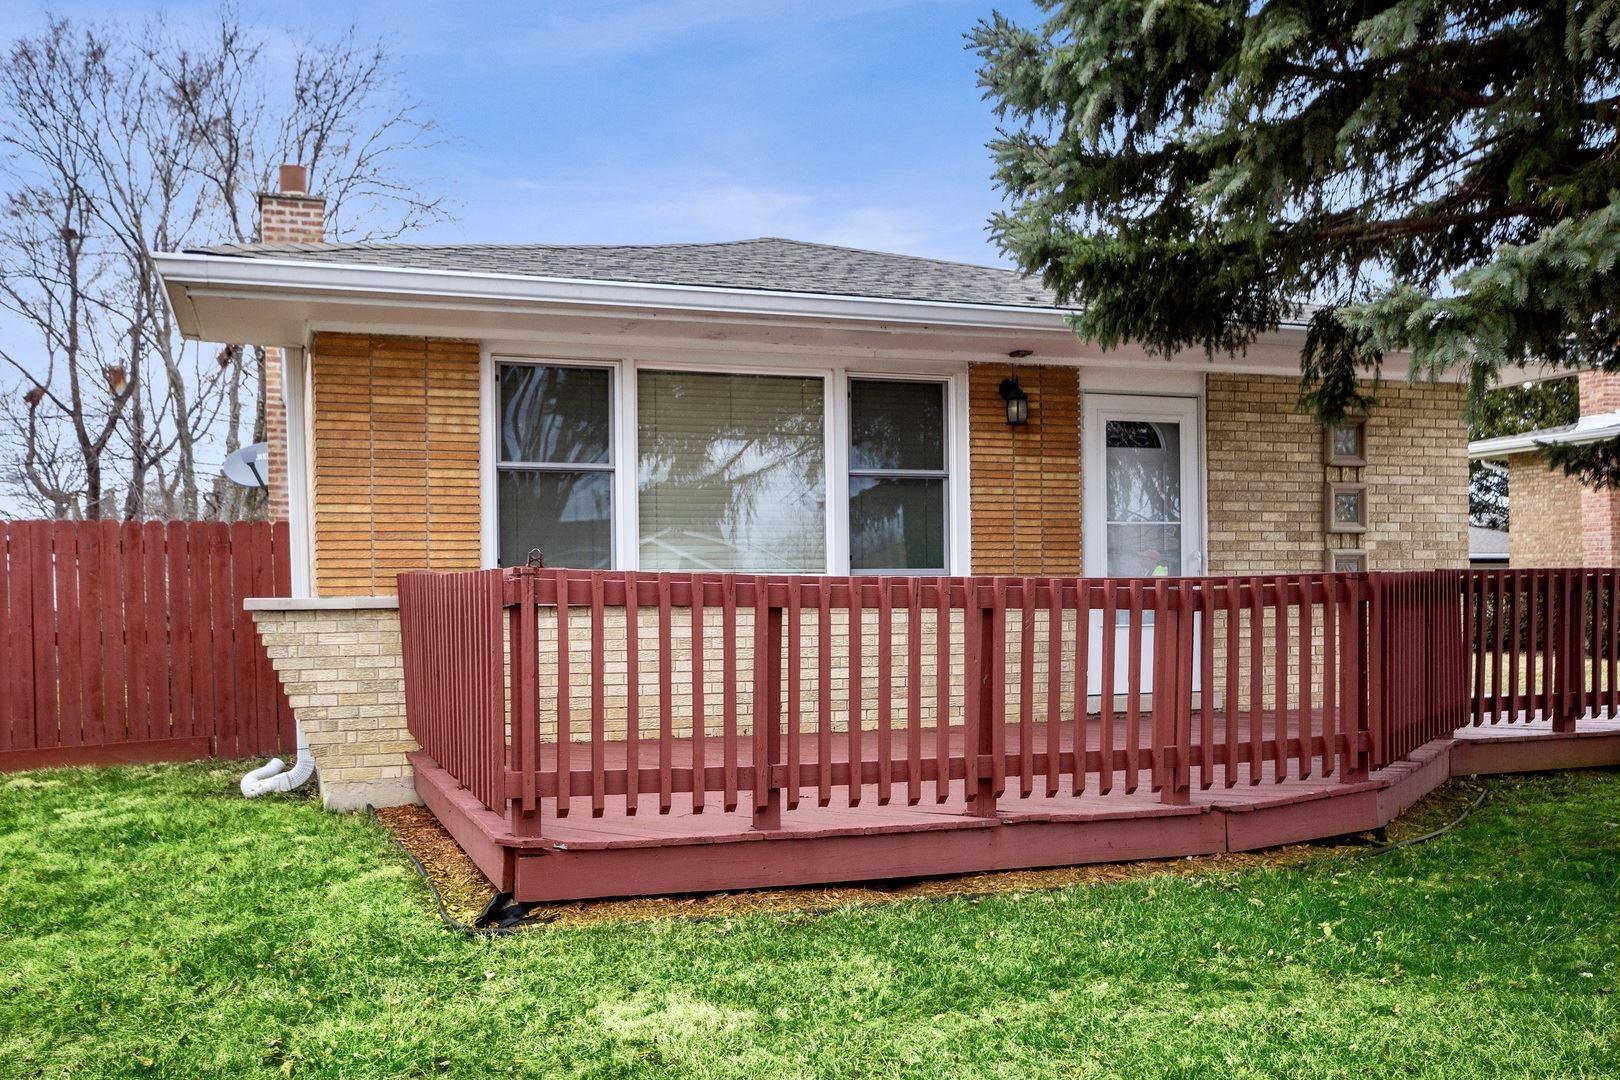 6748 W 88th Place, Oak Lawn, IL 60453 - #: 10672196